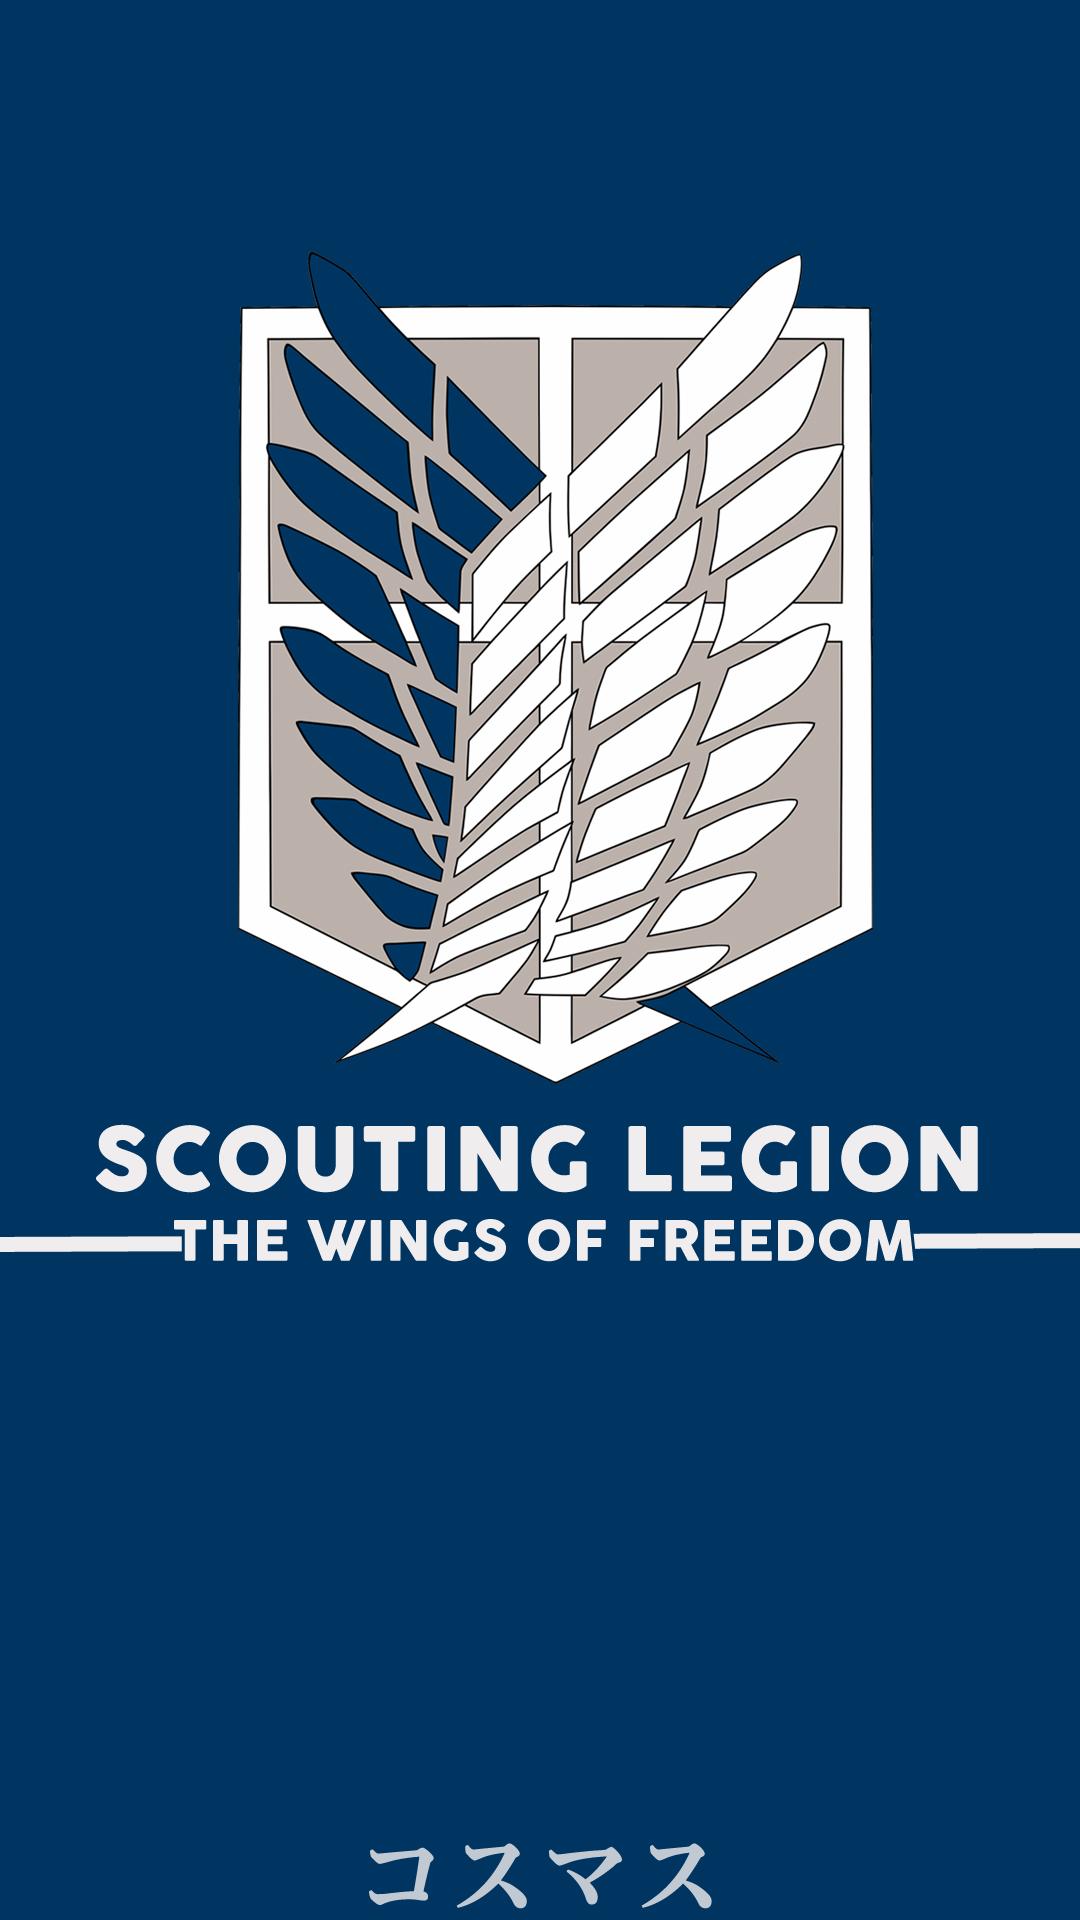 SCOUTING LEGION LOGO -CSMS.jpg